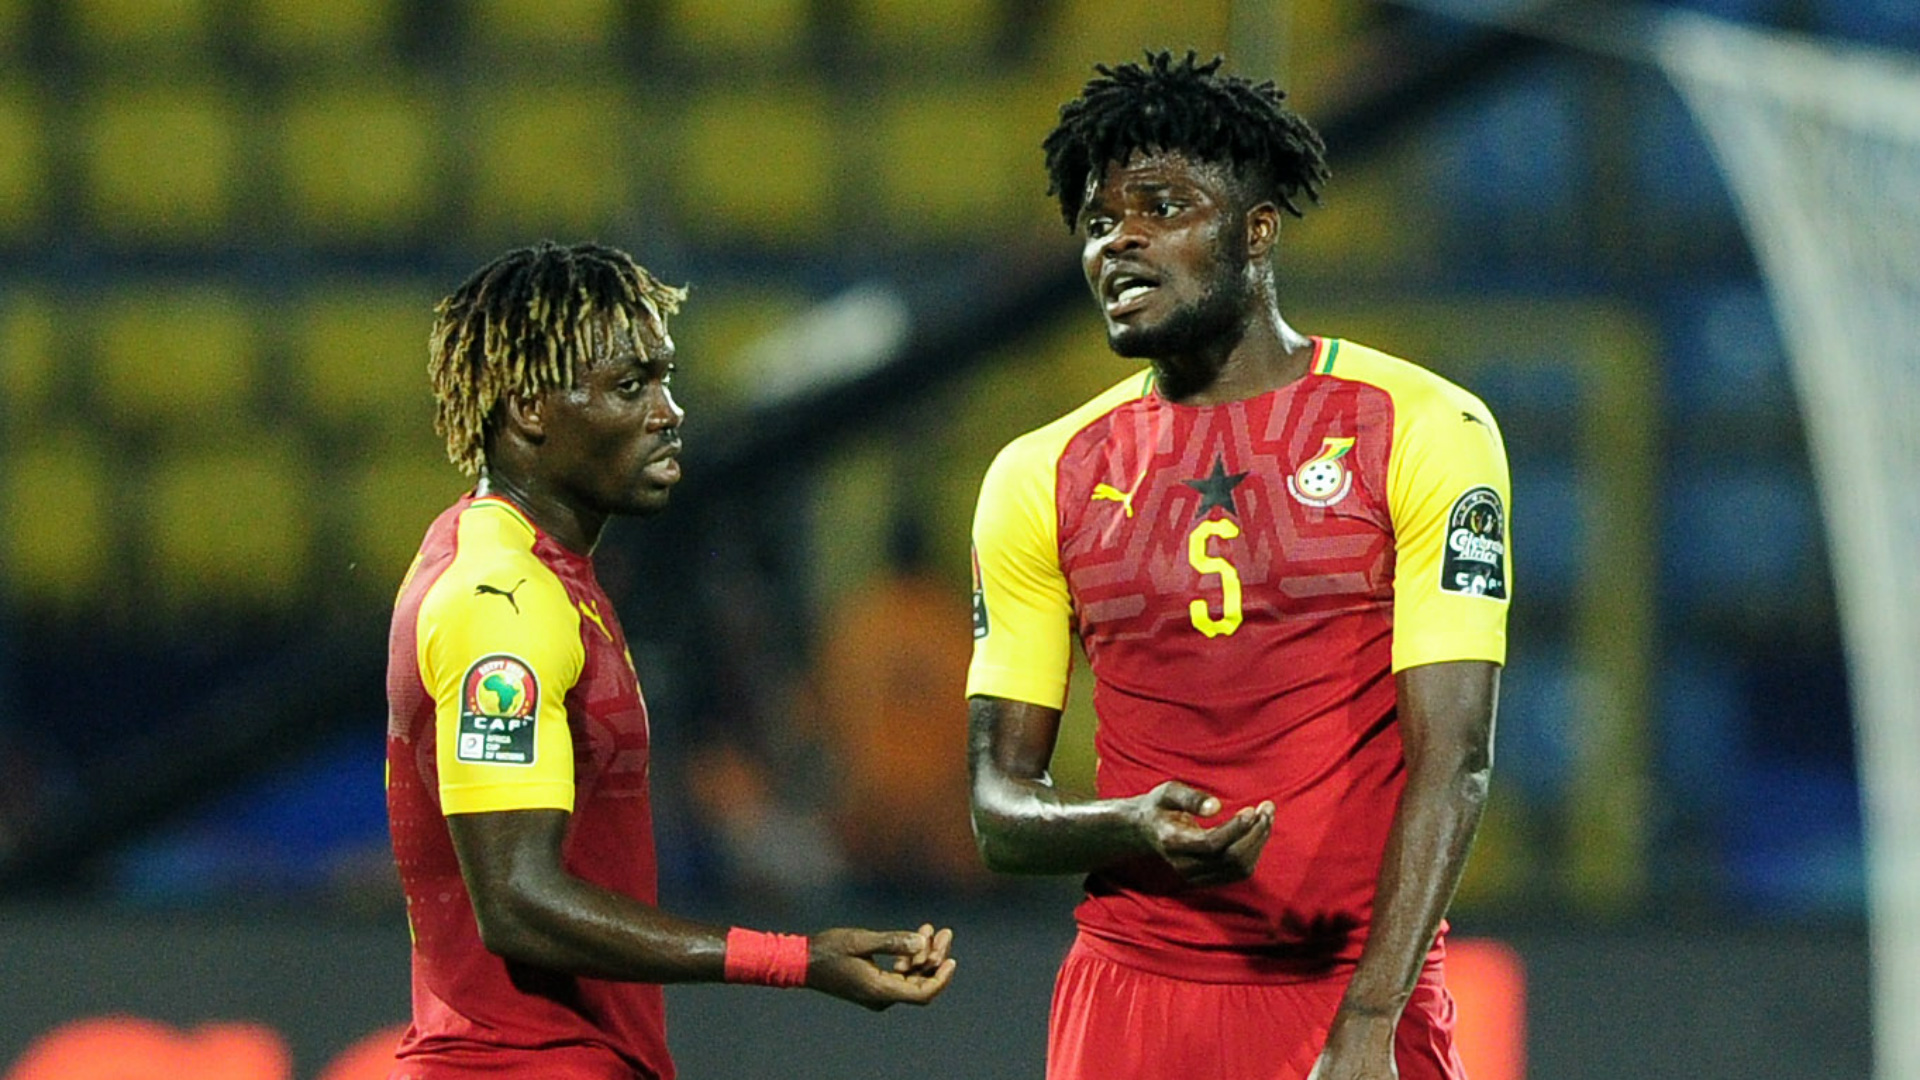 Atsu: Former Chelsea star advises Kudus and other new generation Ghana stars